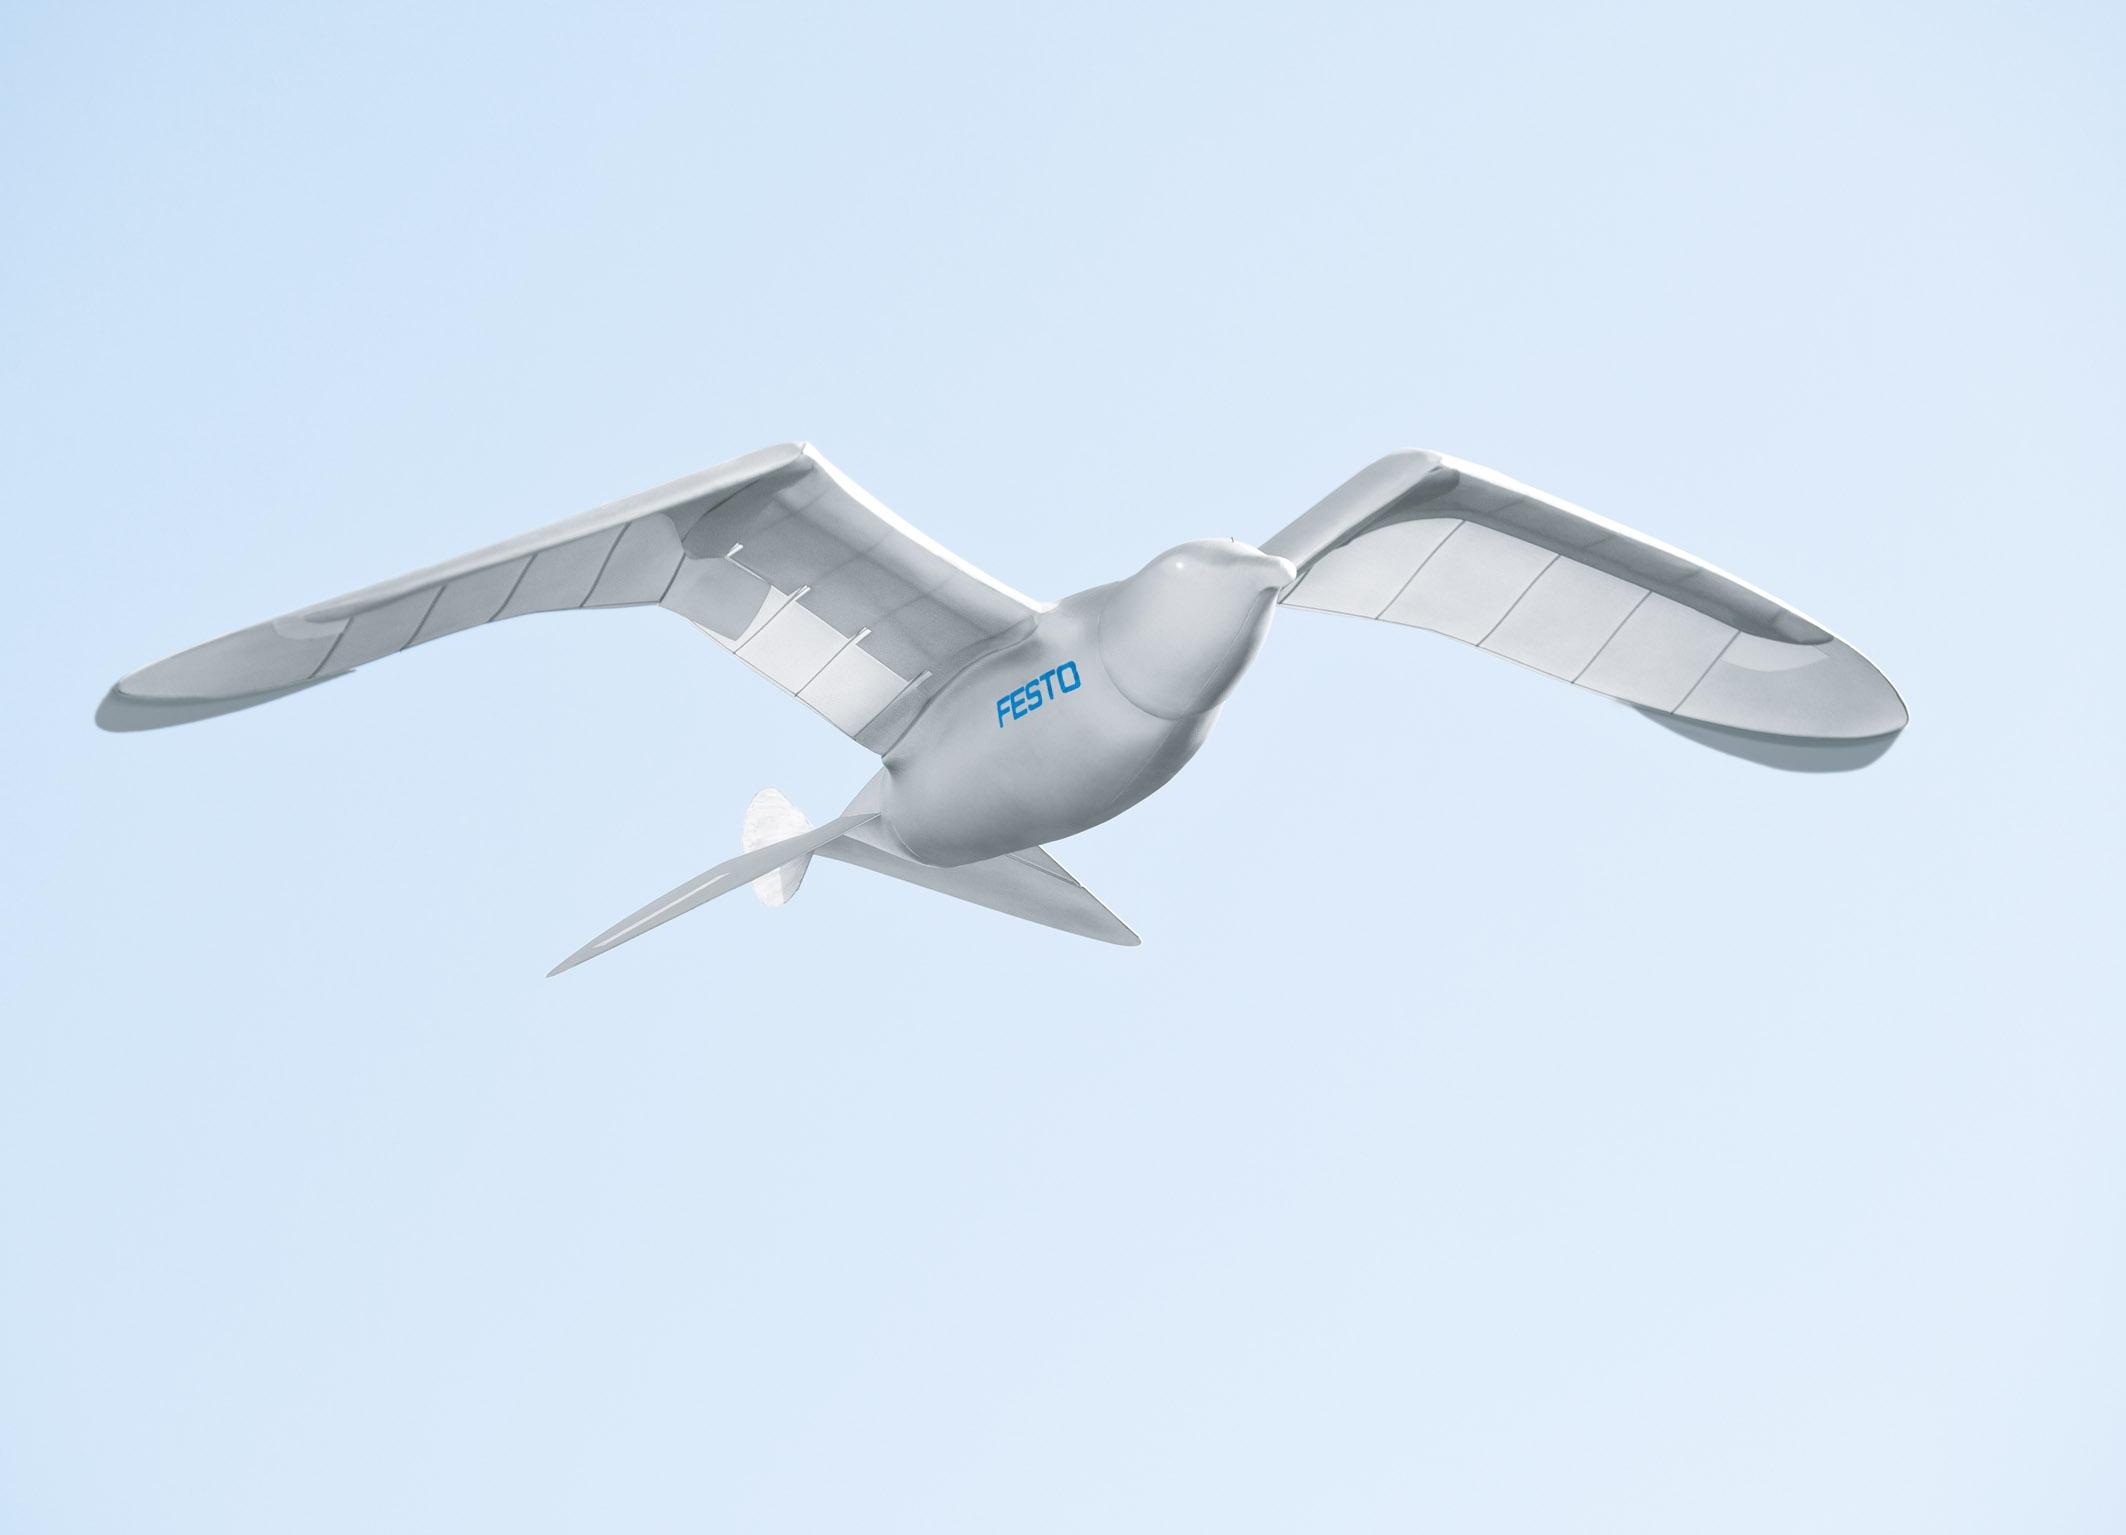 Festo SmartBird Drone